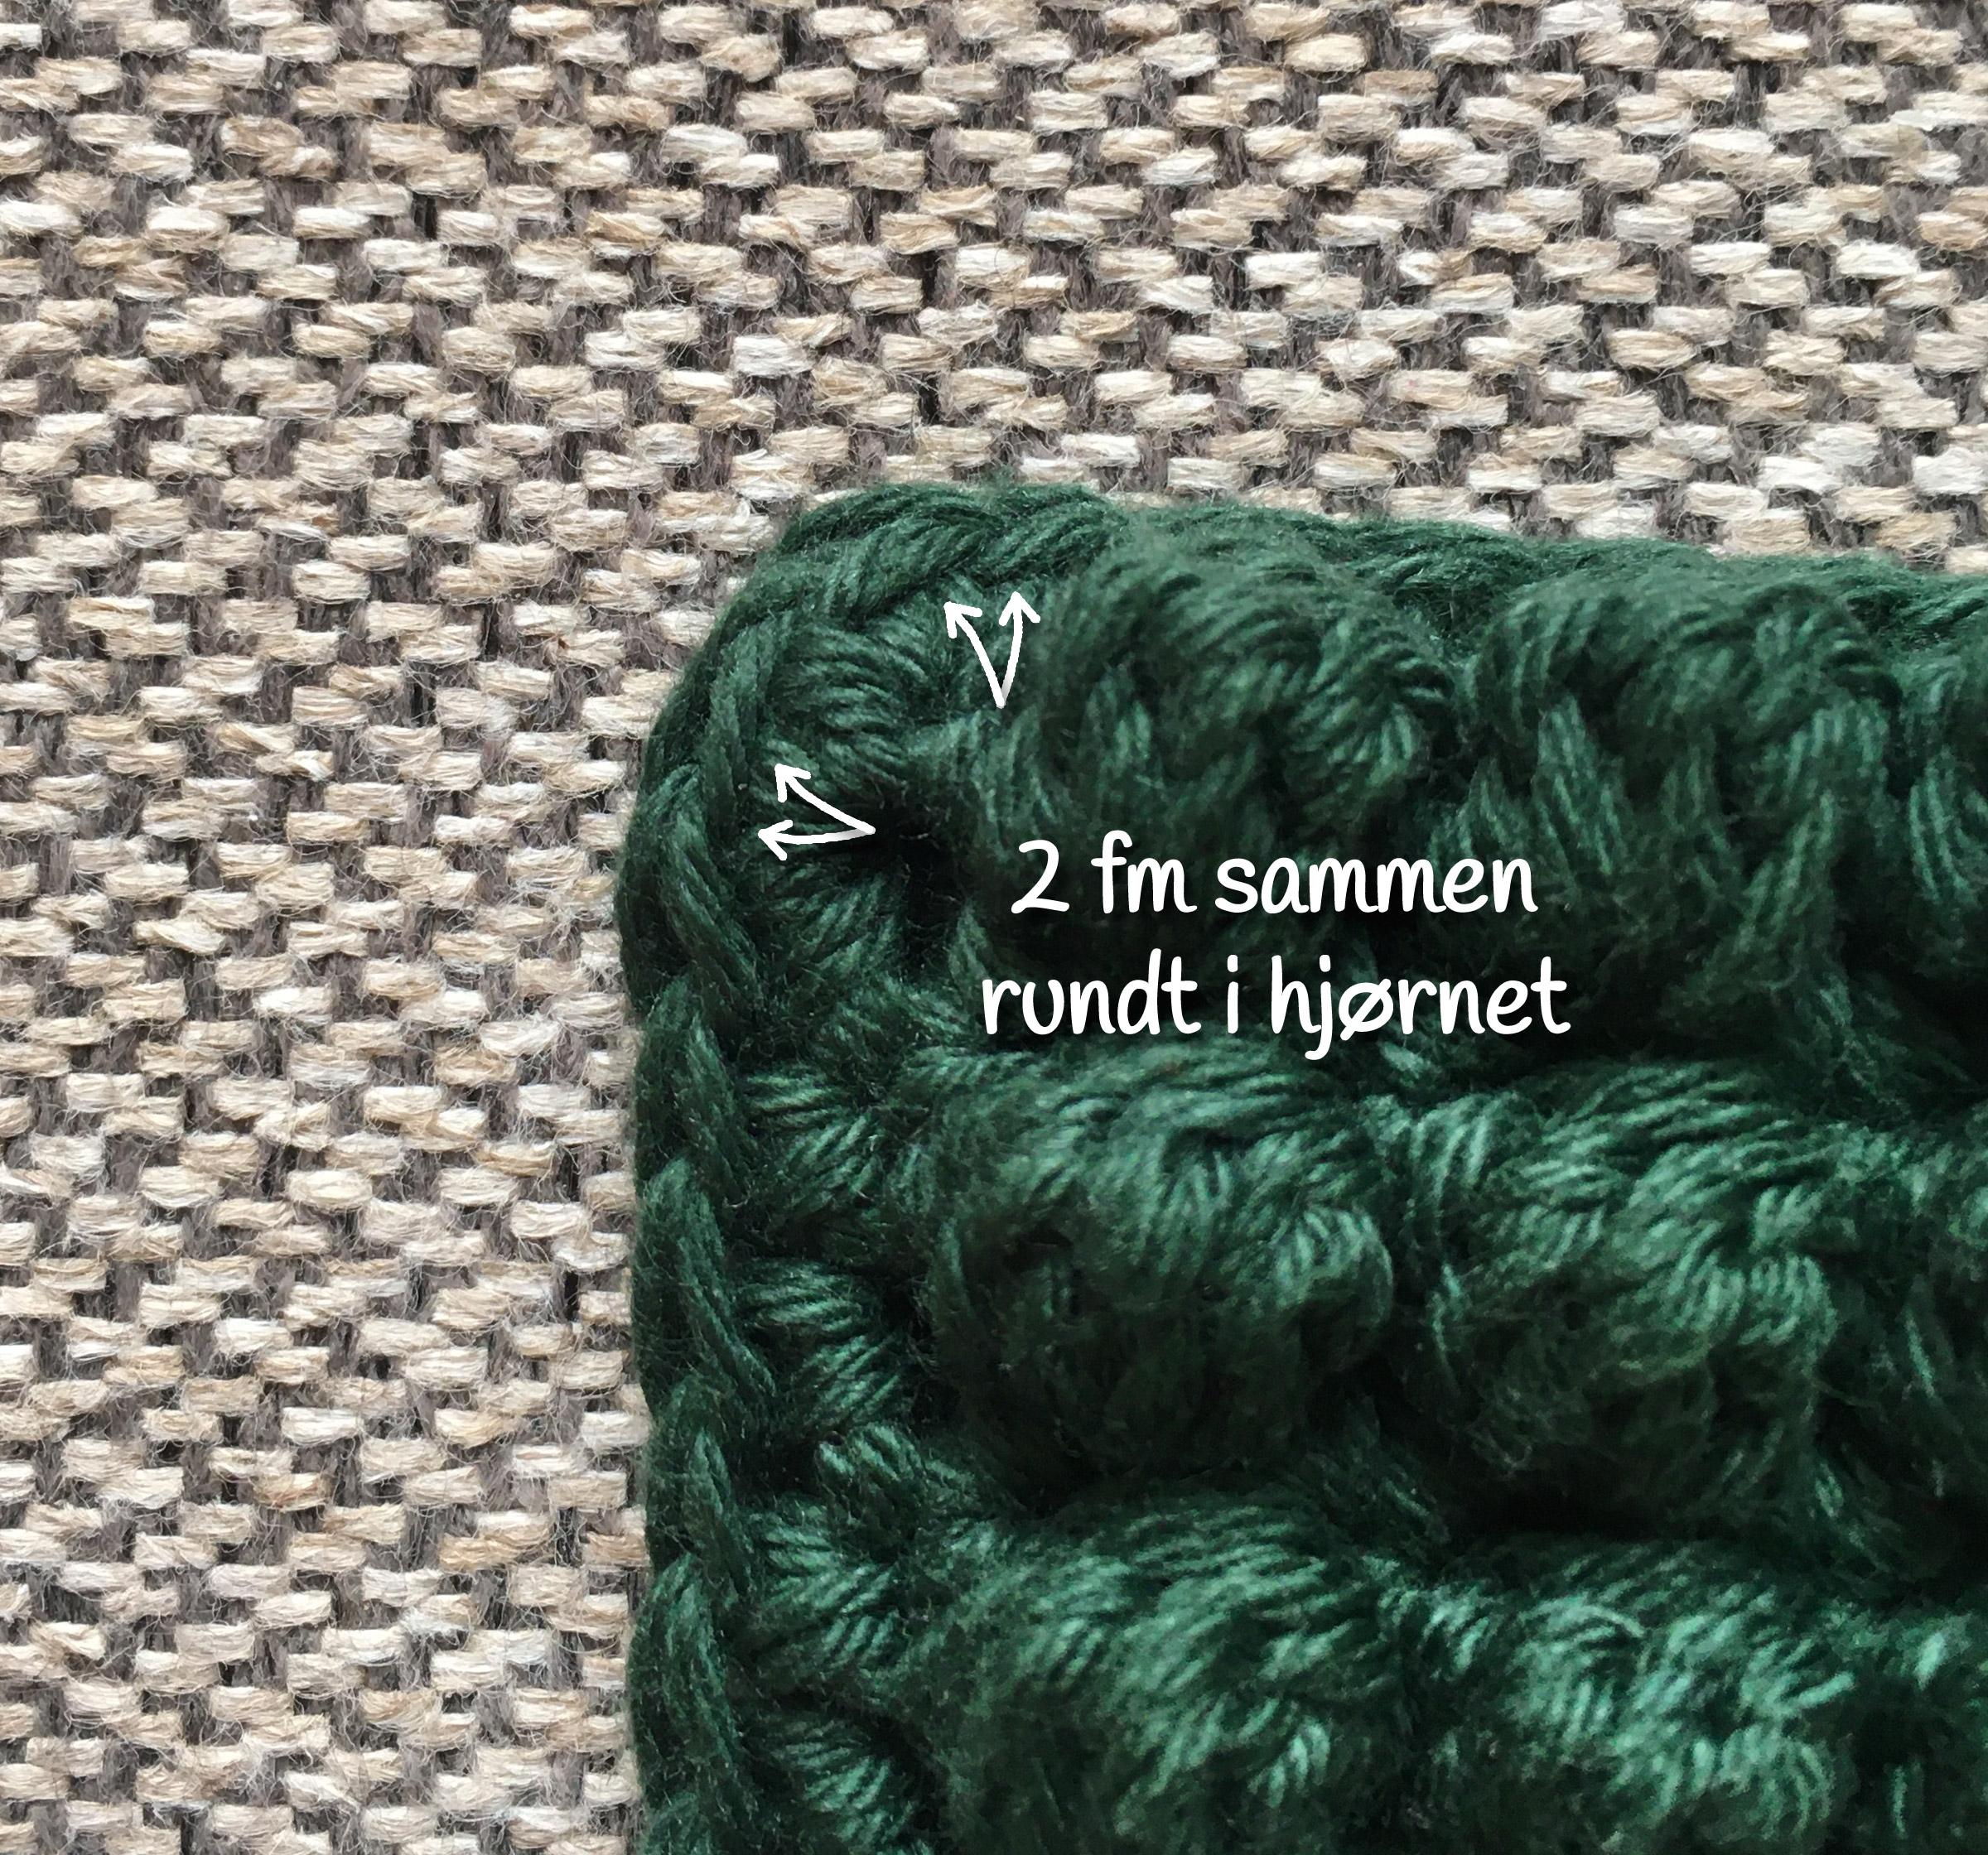 Stine Potholder: Free Crochet Pattern for Potholders with bobbles